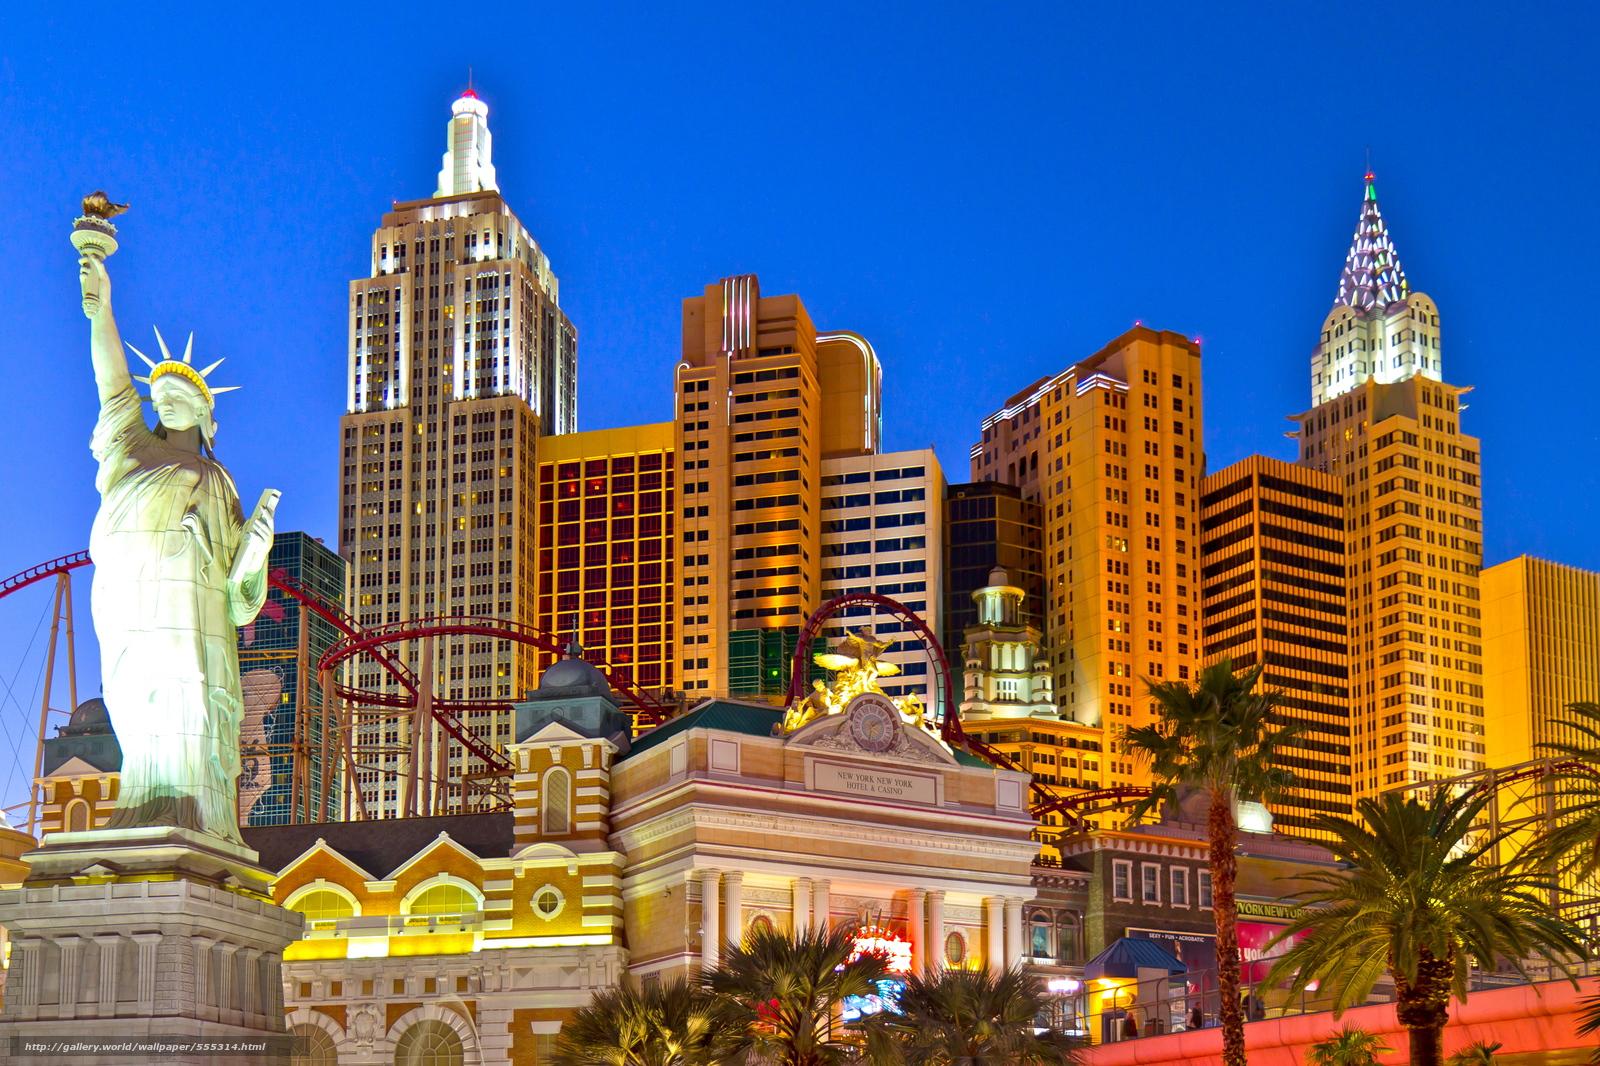 Ny casino free downloads starting a charity casino business